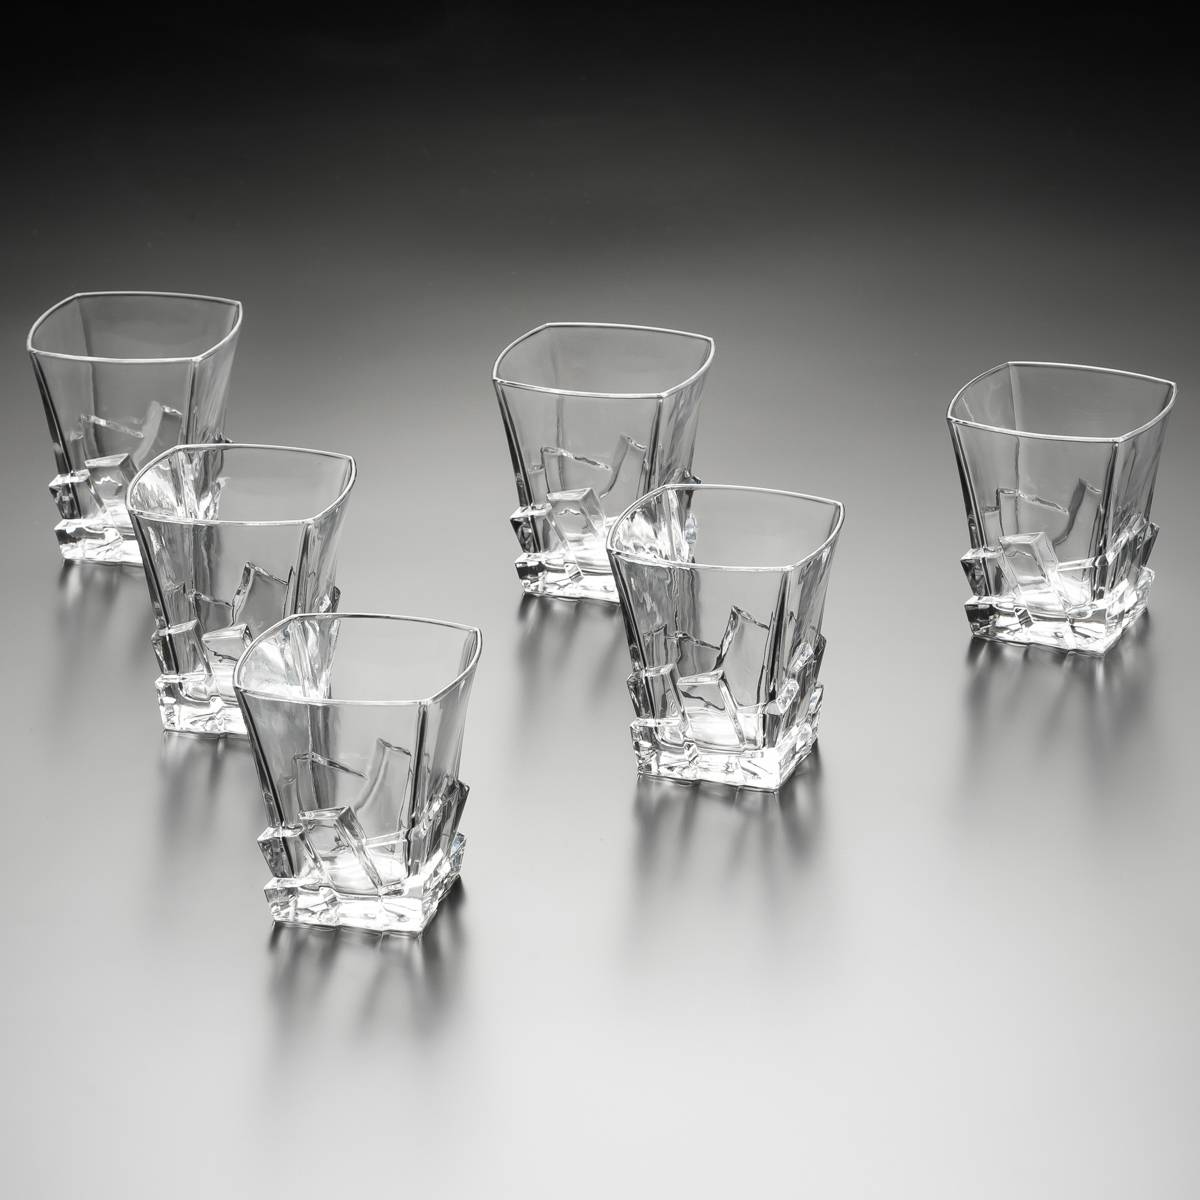 Conjunto 6 Copos para Whisky Bari - 270 ml - em Cristal - Wolff